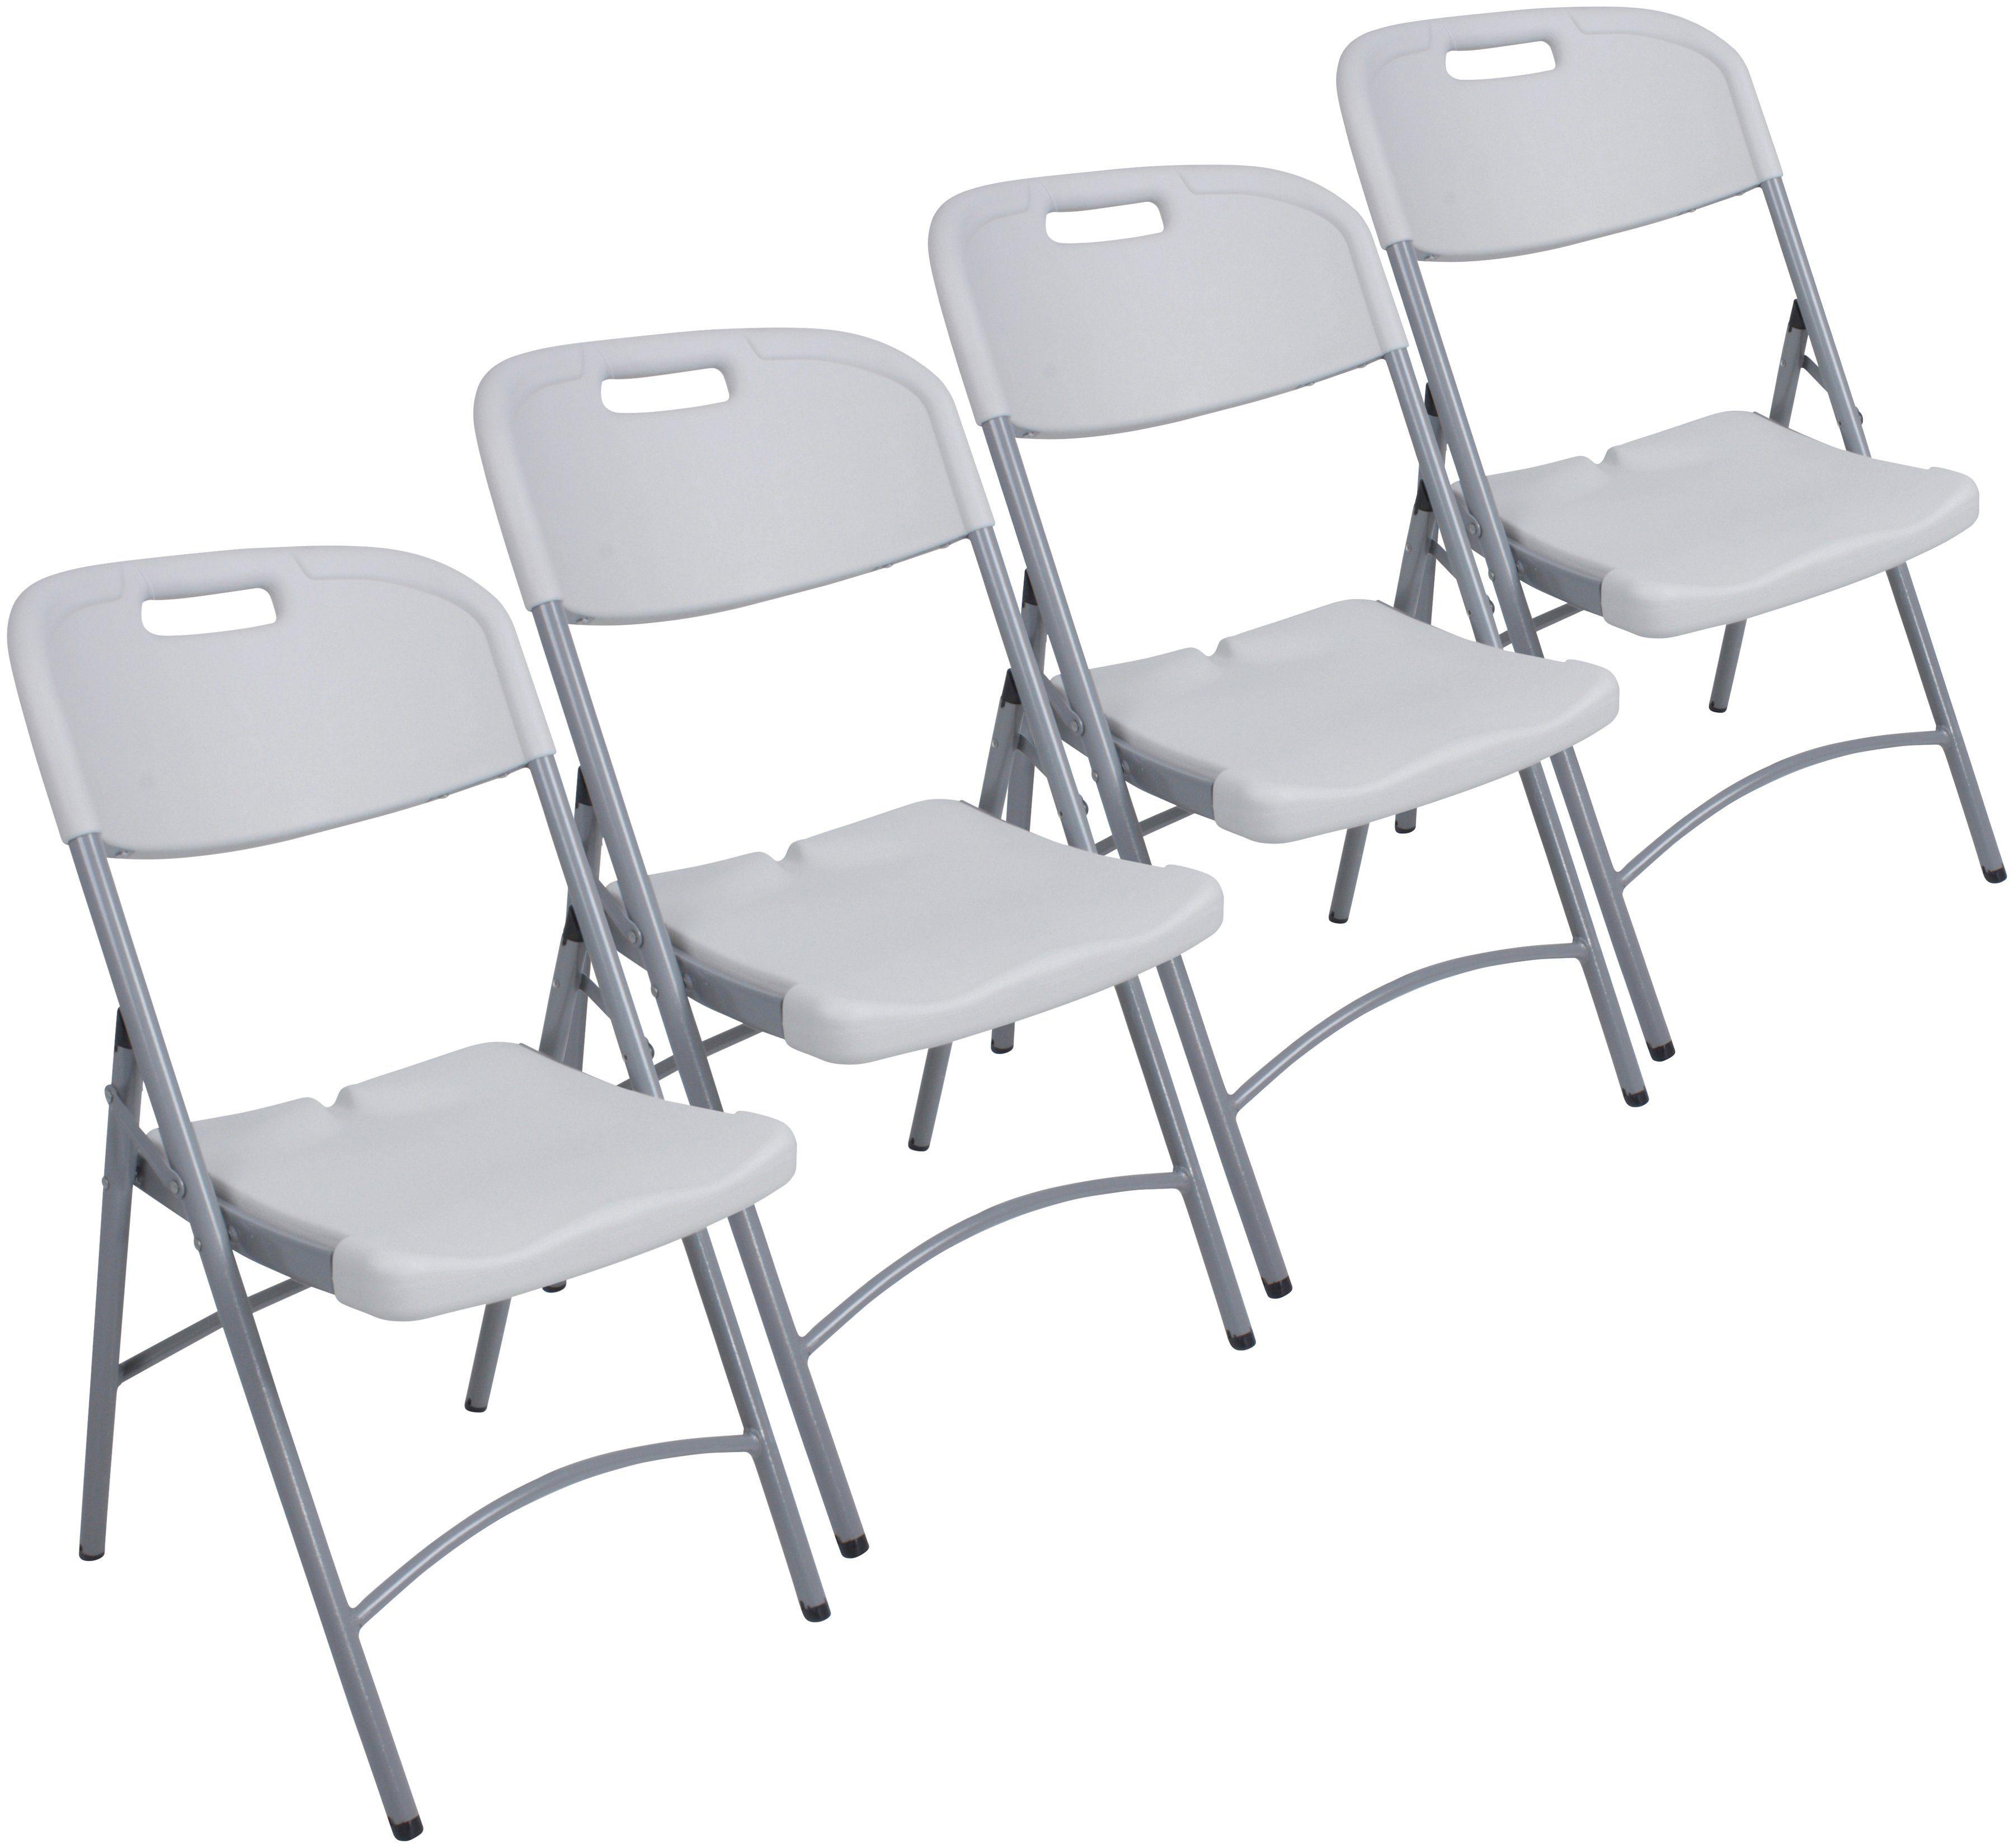 GARDEN PLEASURE Gartenstuhl »MUFARO«, (4er Set), Kunststoff/Stahl, klappbar, weiß